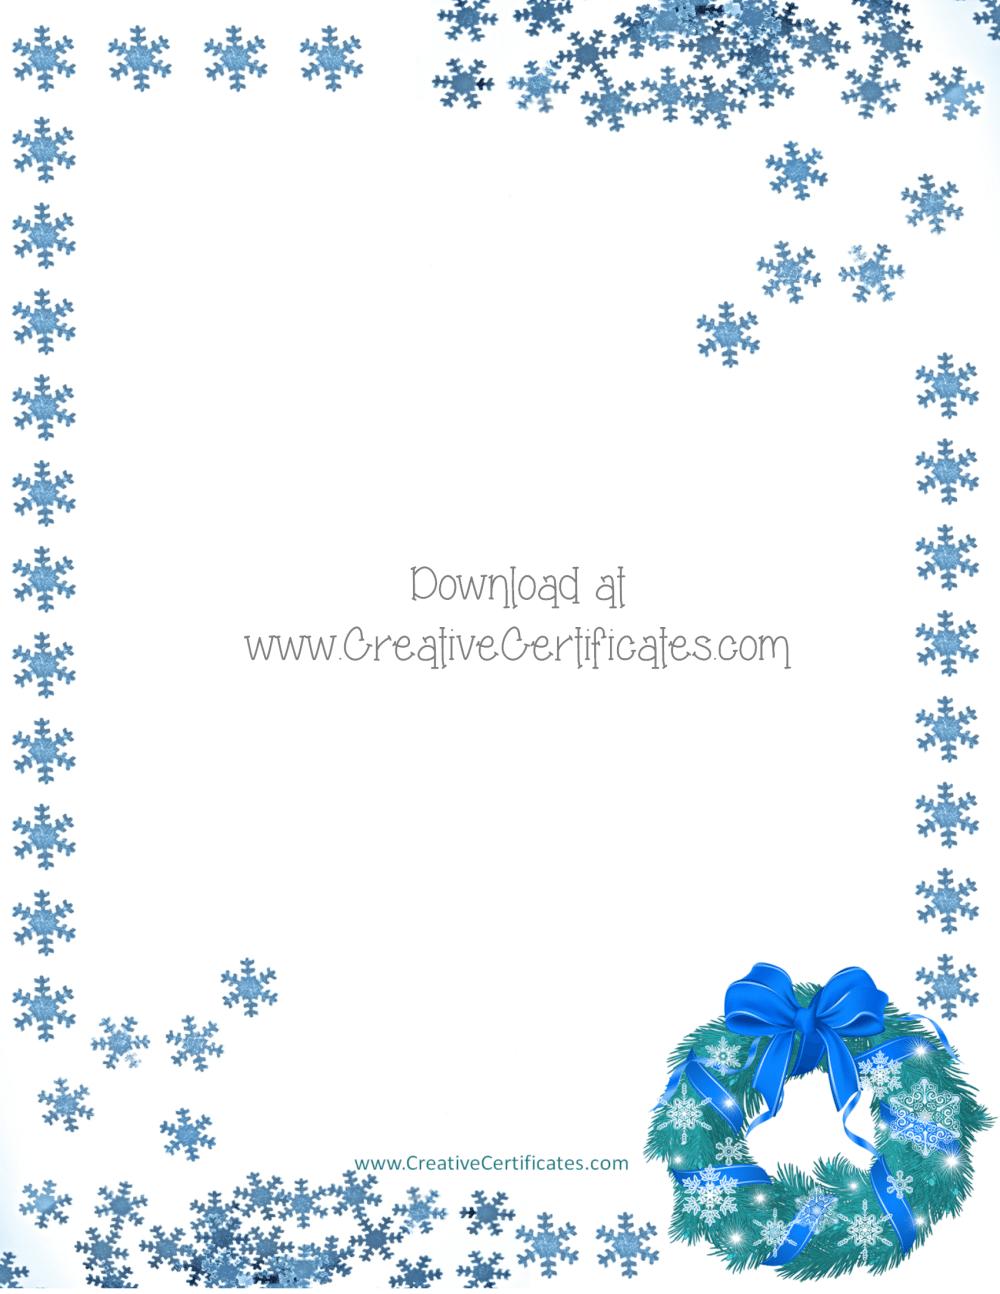 Free Christmas Border Templates Customize Online Then